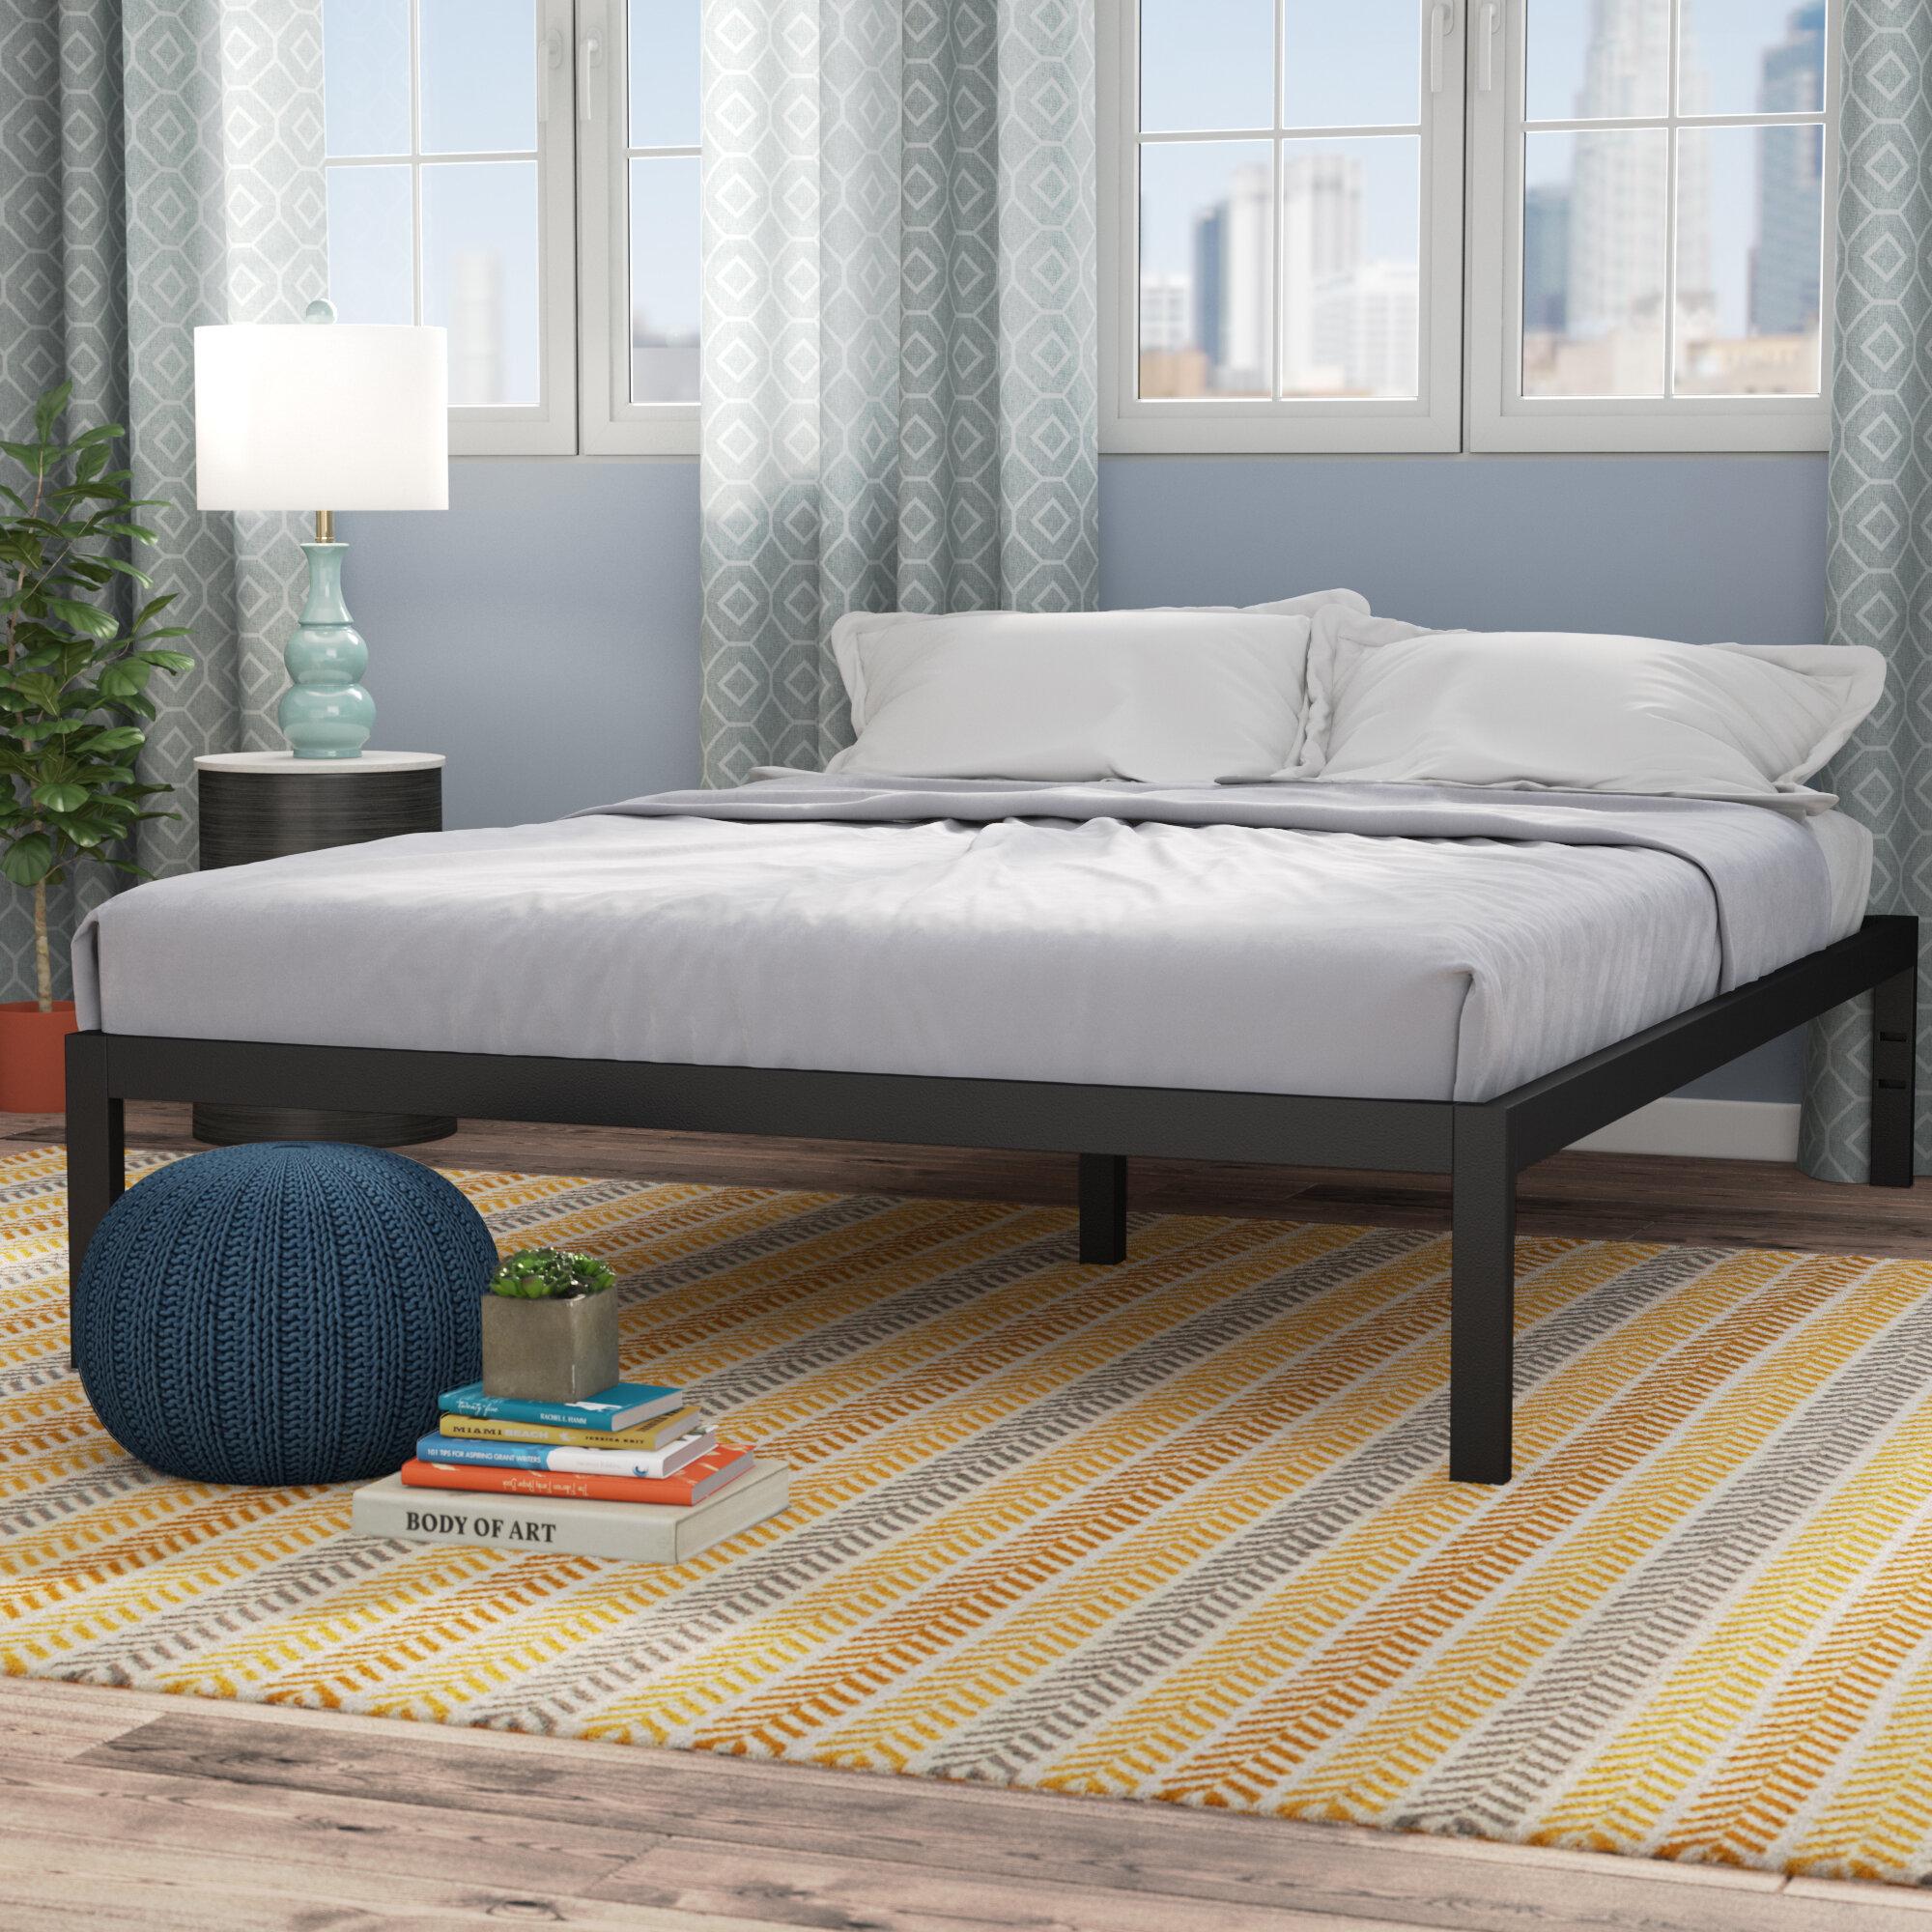 cfm frame product platform master floor storage platformbedwithstorage bed hayneedle basic prepac